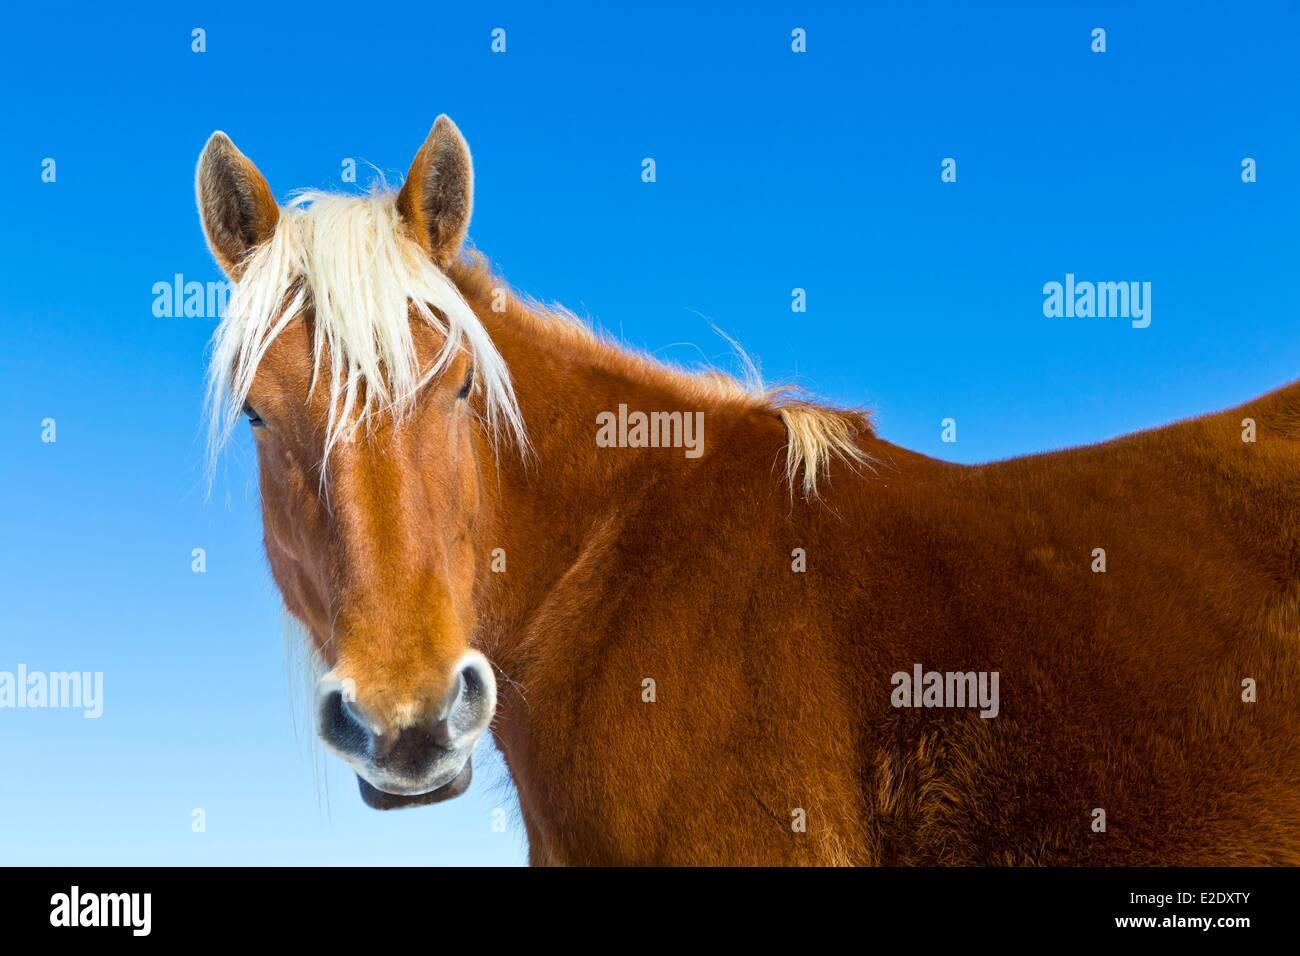 France Cantal close-up of horse Parc Naturel Regional des Volcans d'Auvergne (Auvergne Volcanoes Natural Regional - Stock Image